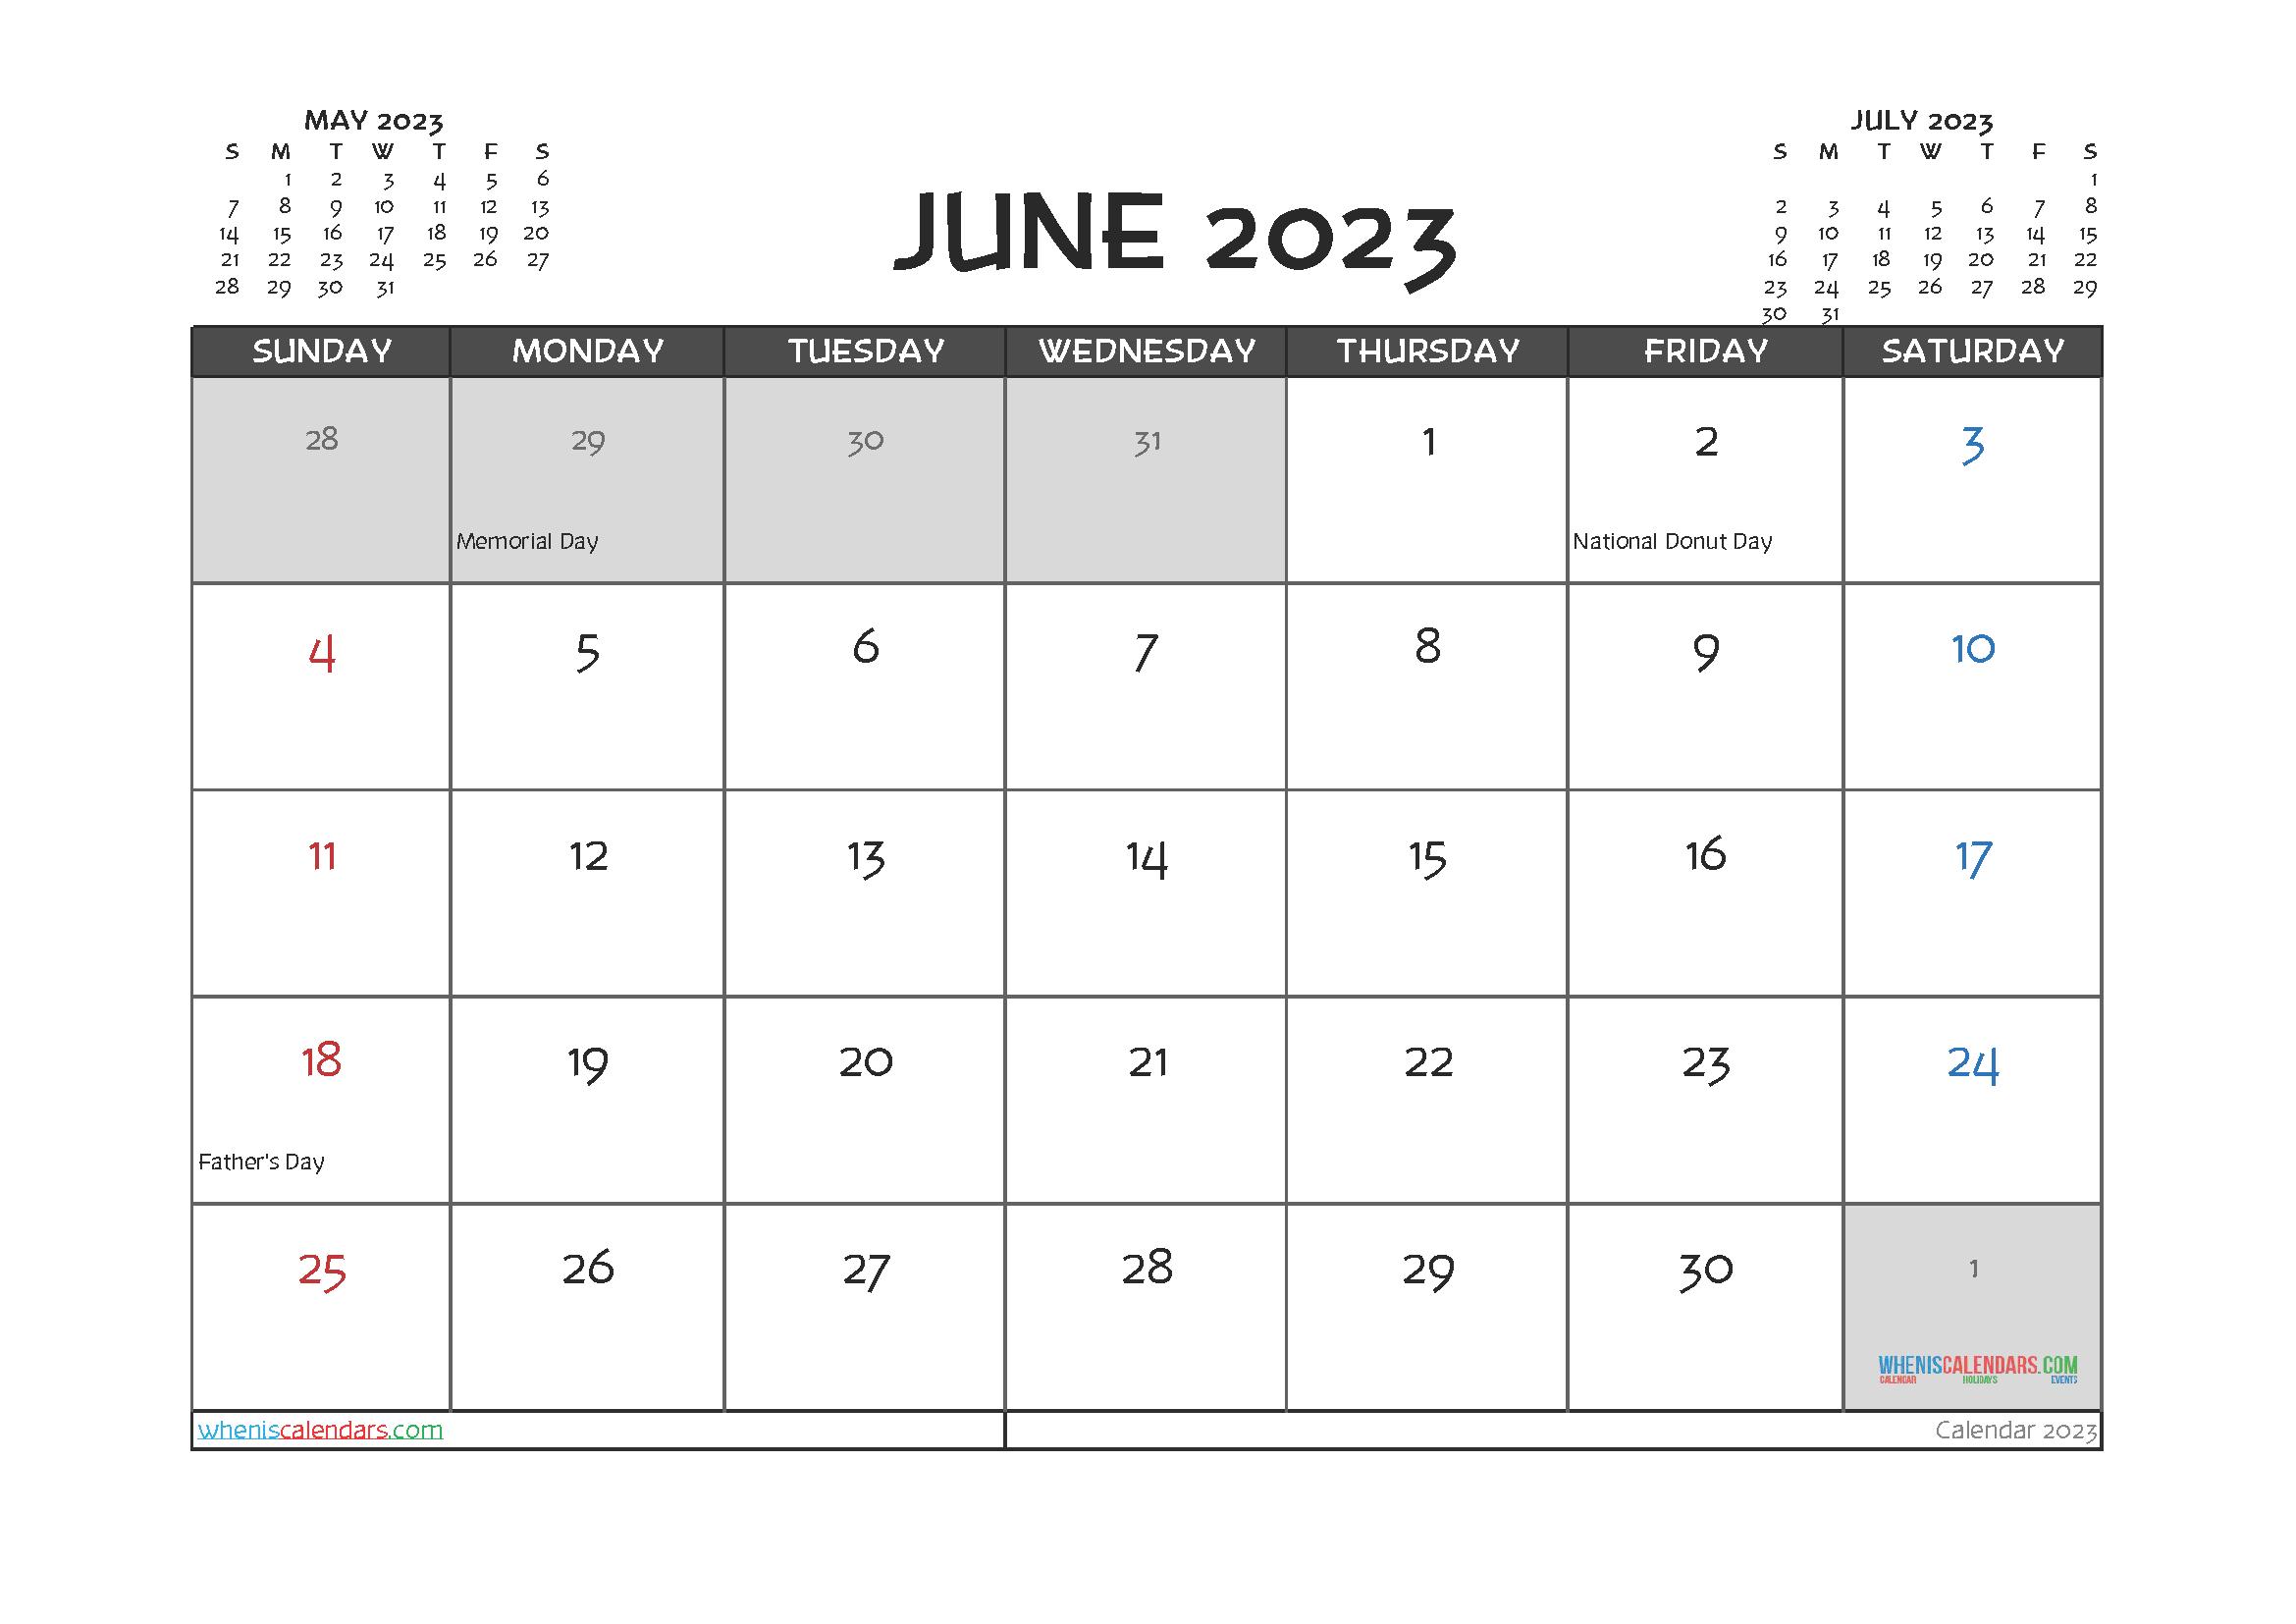 June 2023 Calendar Printable For Free